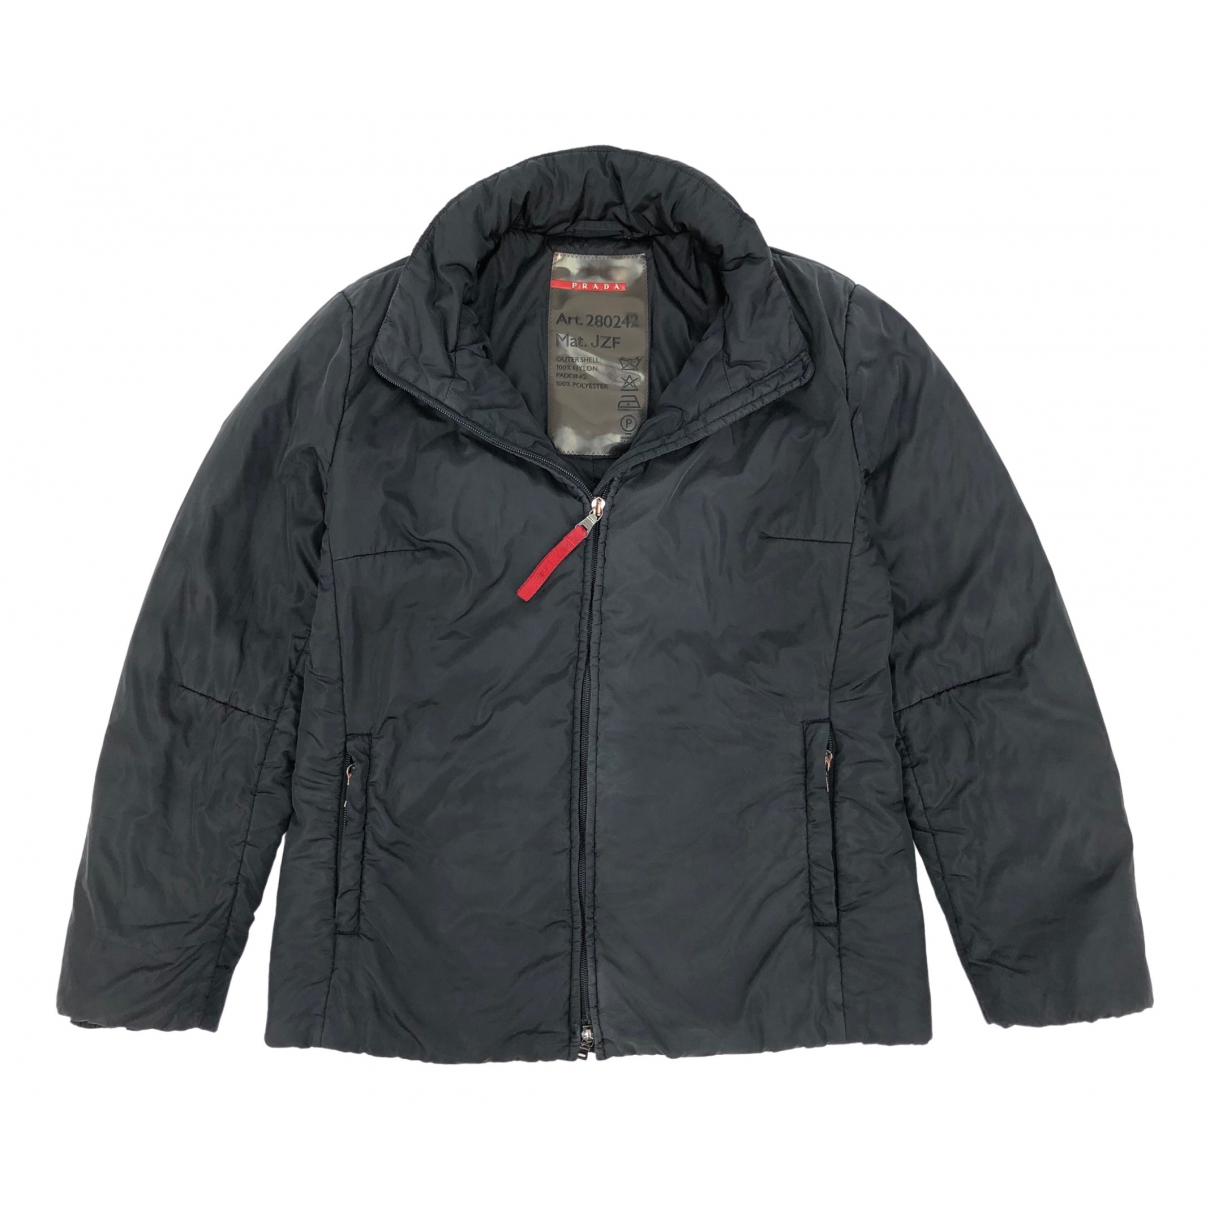 Prada \N Black jacket for Women M International